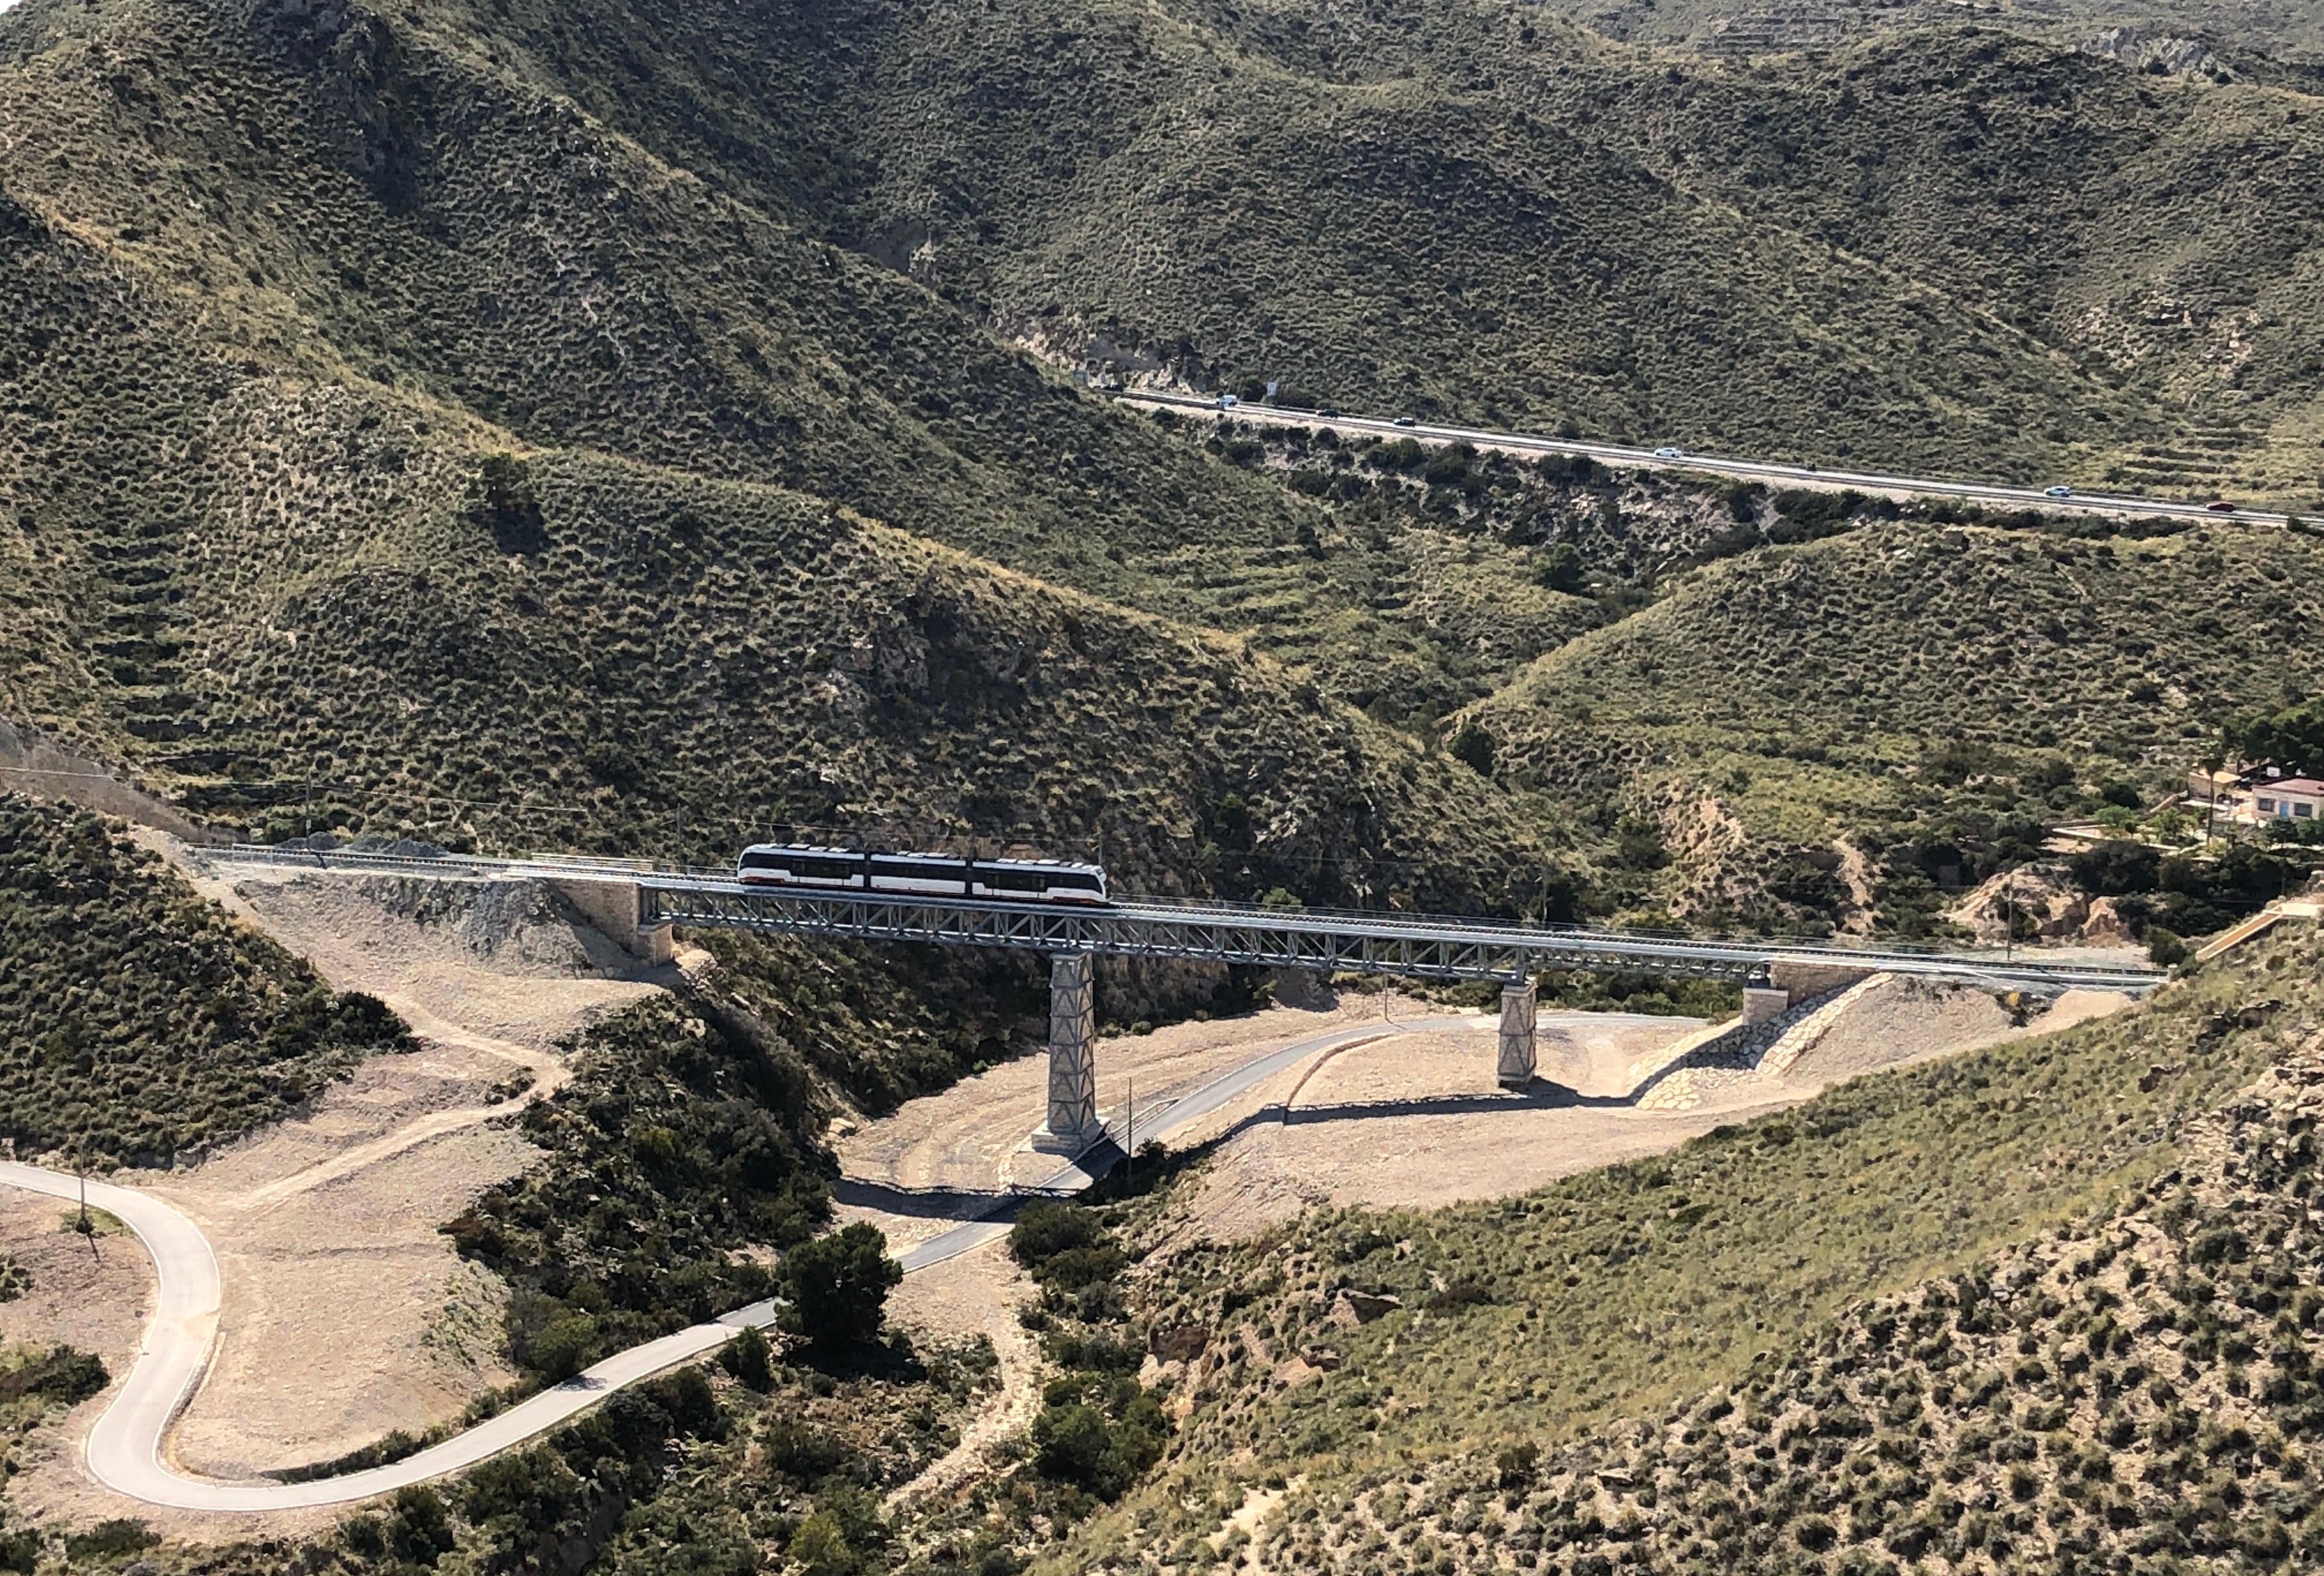 Barranc d'Aigües bridge